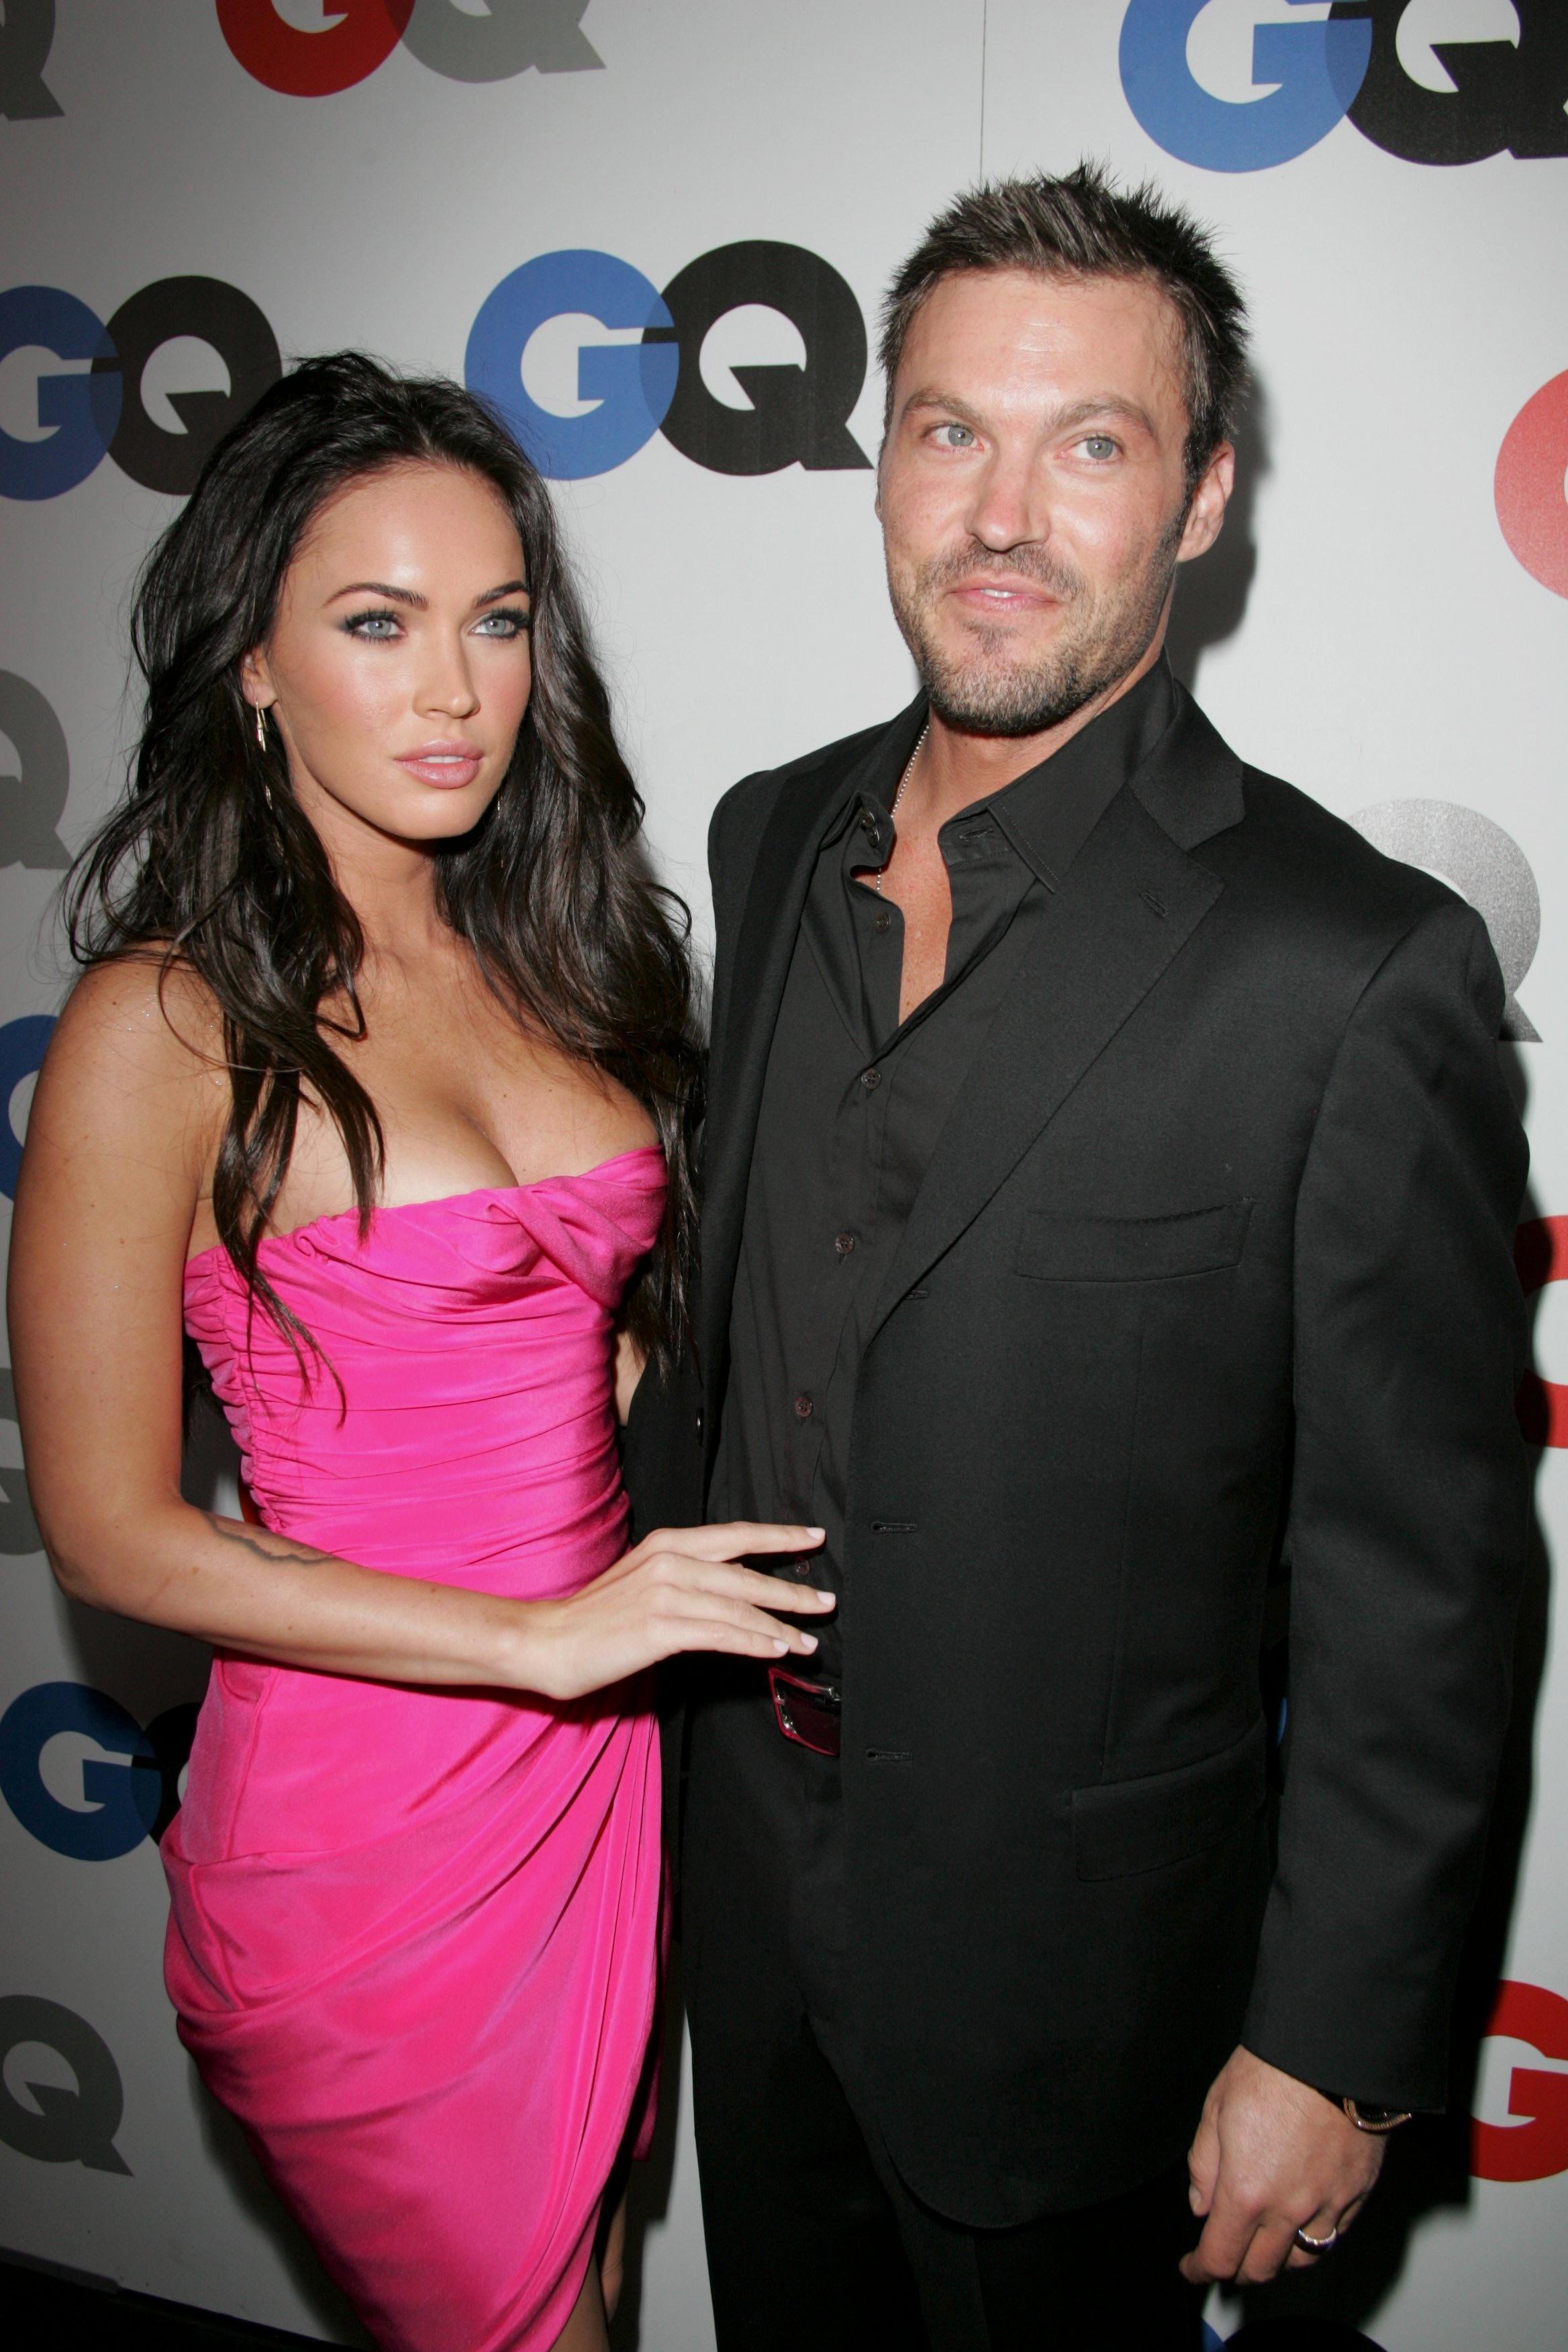 Megan Fox and Brian Austin Green GQ Men of the Year Party, Los Angeles, America - 18 Nov 2008